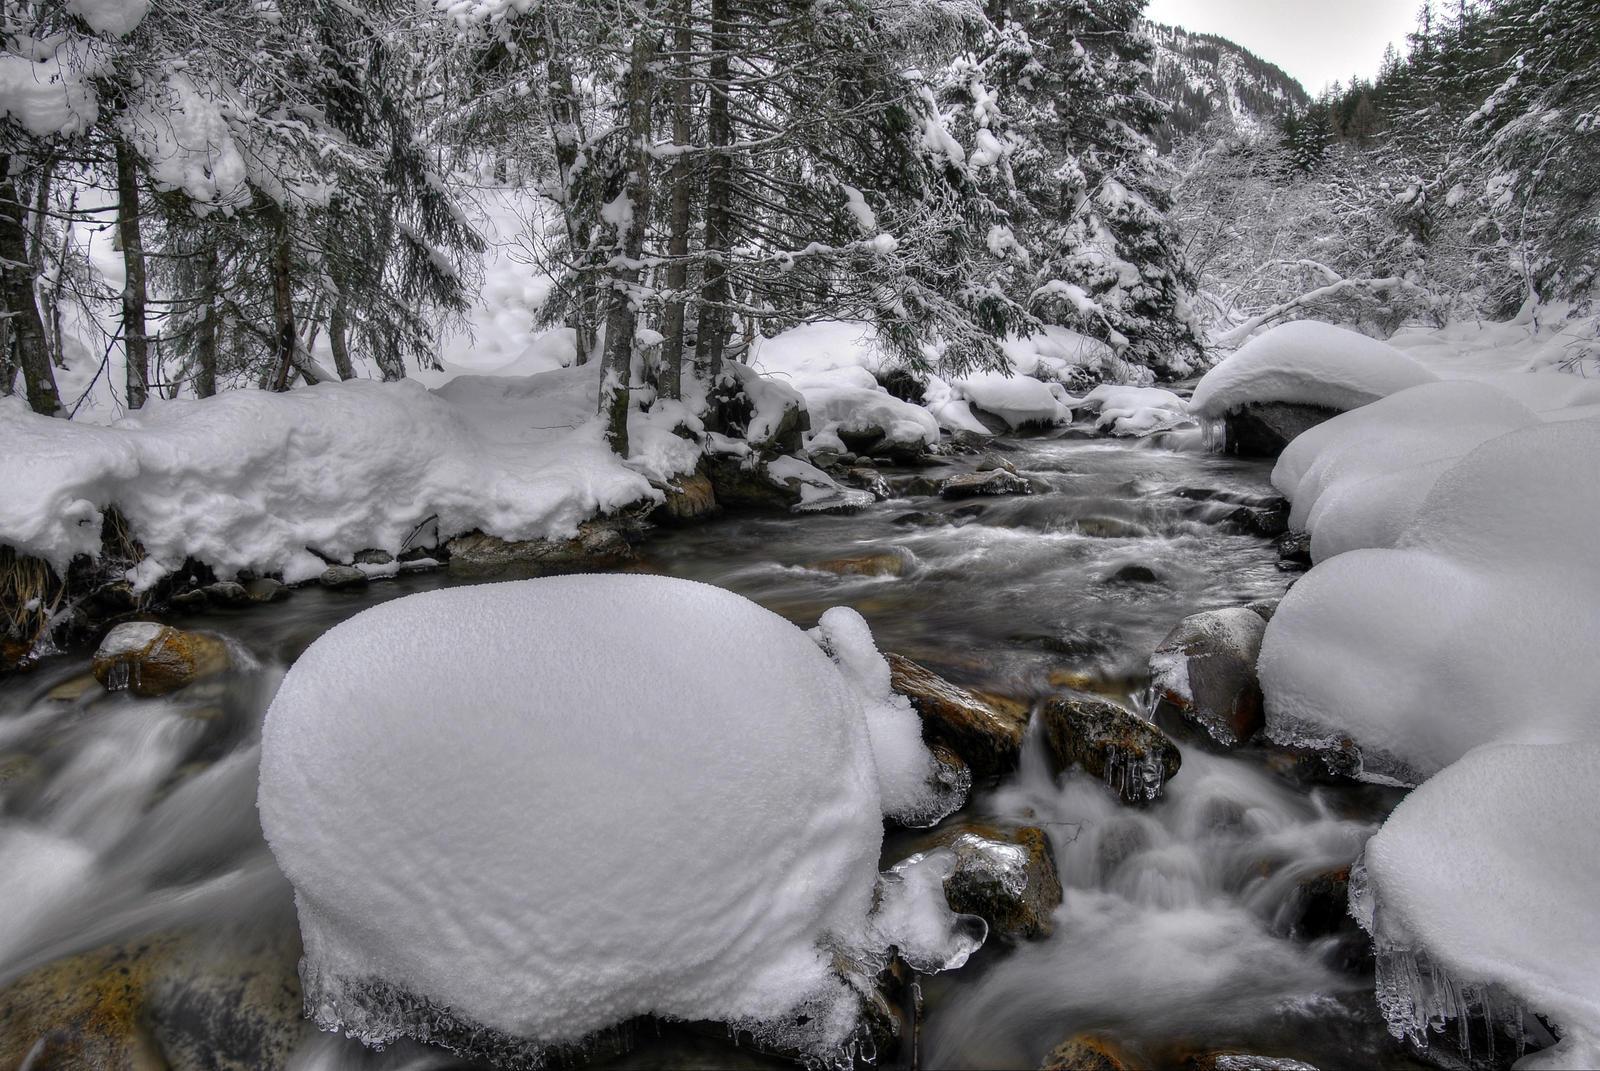 Freezing Riverscape by Burtn